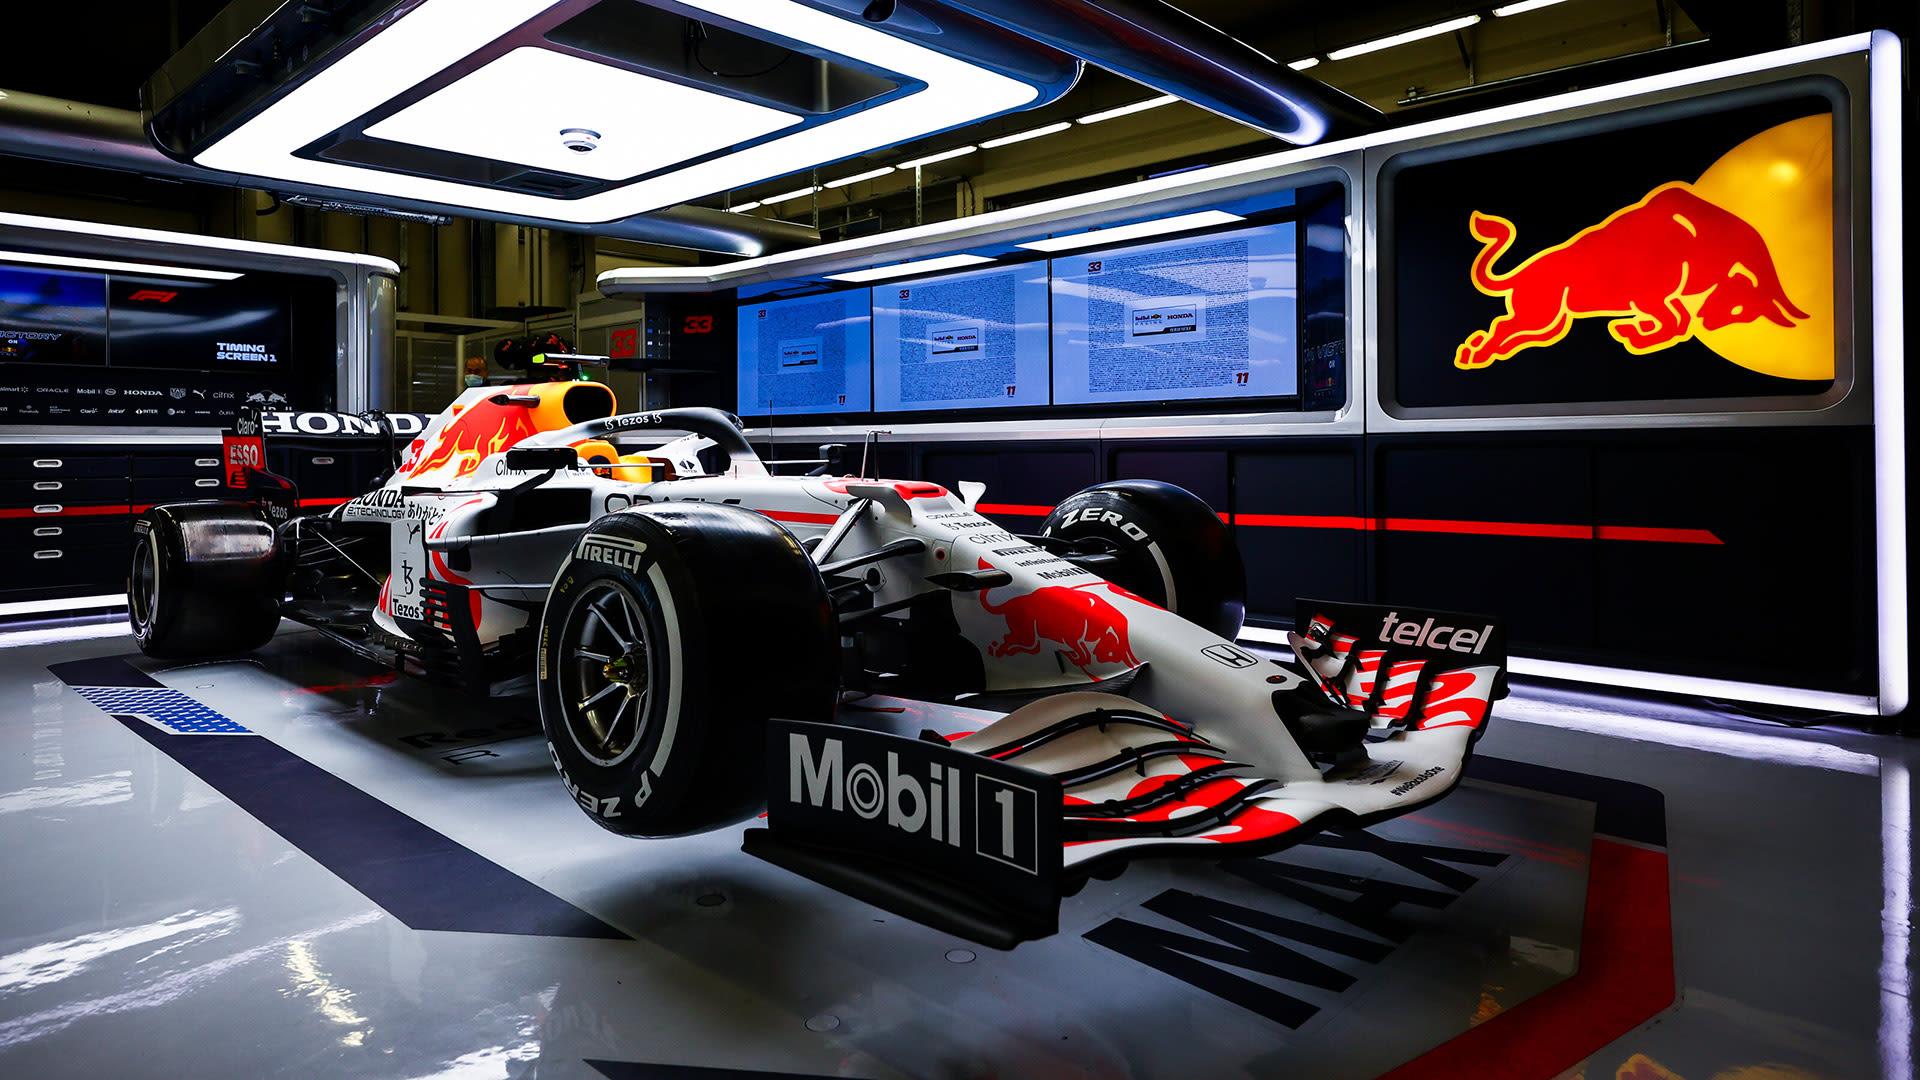 F1 - Formula One Updates cover image